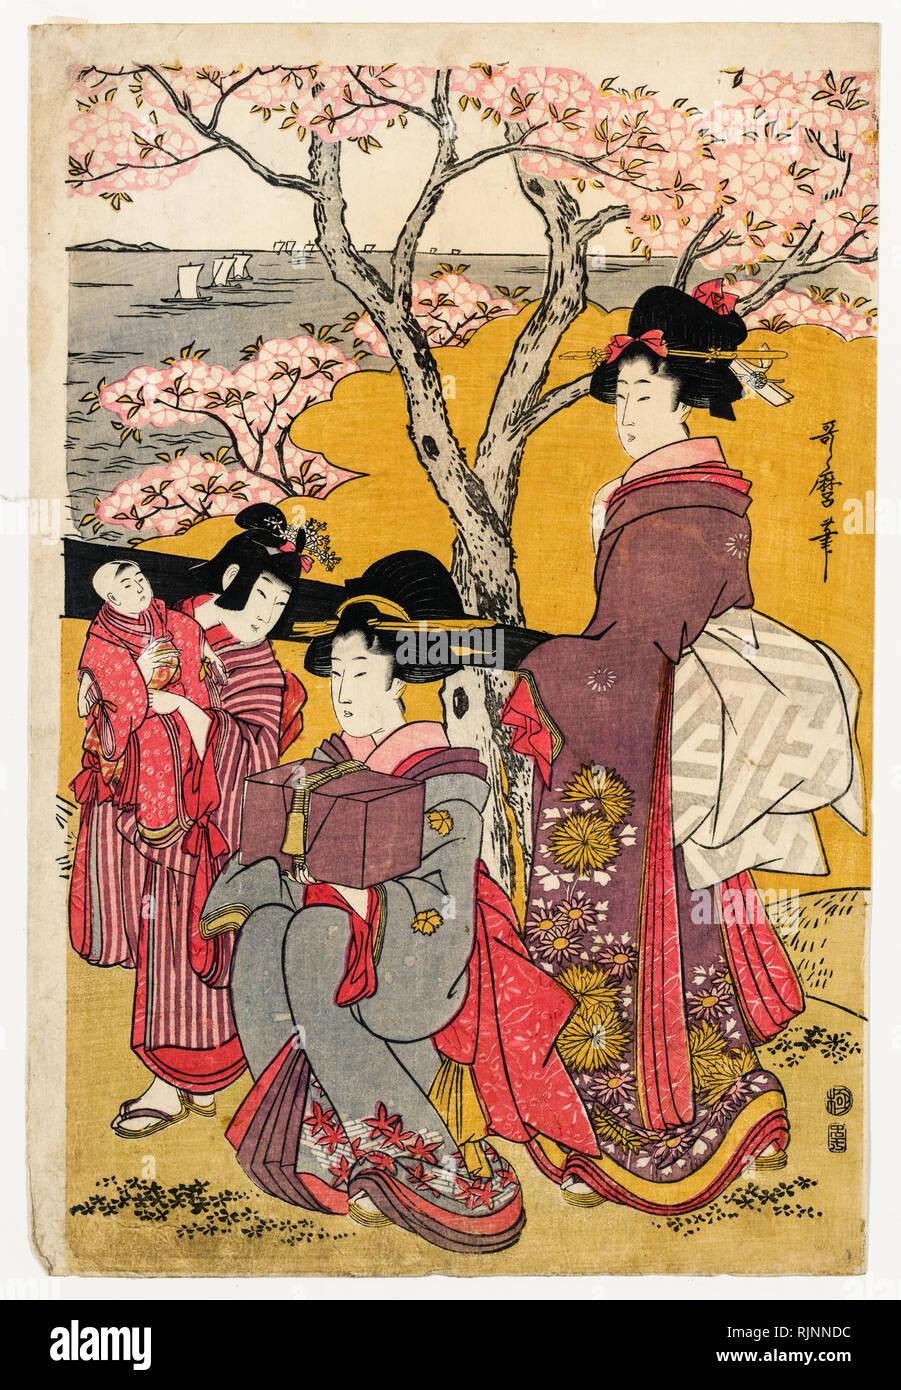 Japanese Art, Utamaro Kitagawa, 1805, Cherry viewing at Gotenyama, woodcut print - Stock Image